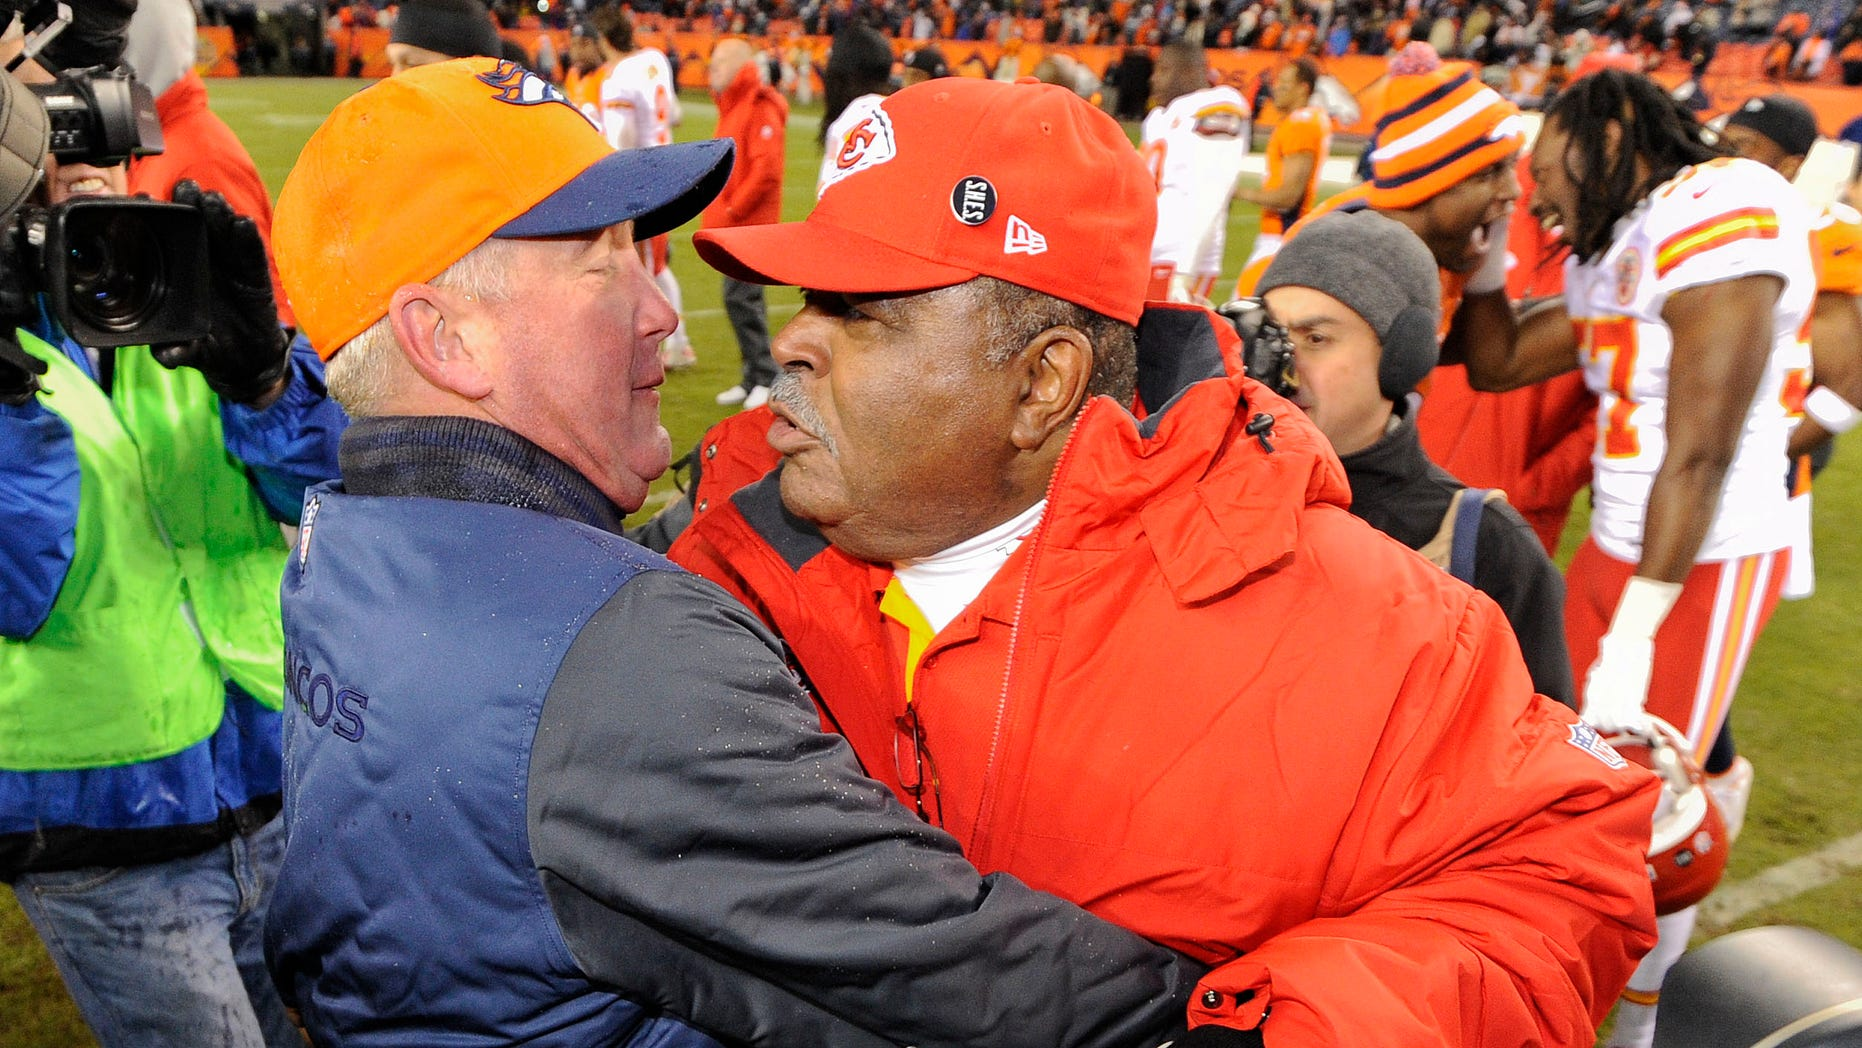 Denver Broncos head coach John Fox, left, greets Kansas City Chiefs coach Romeo Crennel at the end of an NFL football game, Sunday, Dec. 30, 2012, in Denver. Denver won 38-3. (AP Photo/Jack Dempsey)